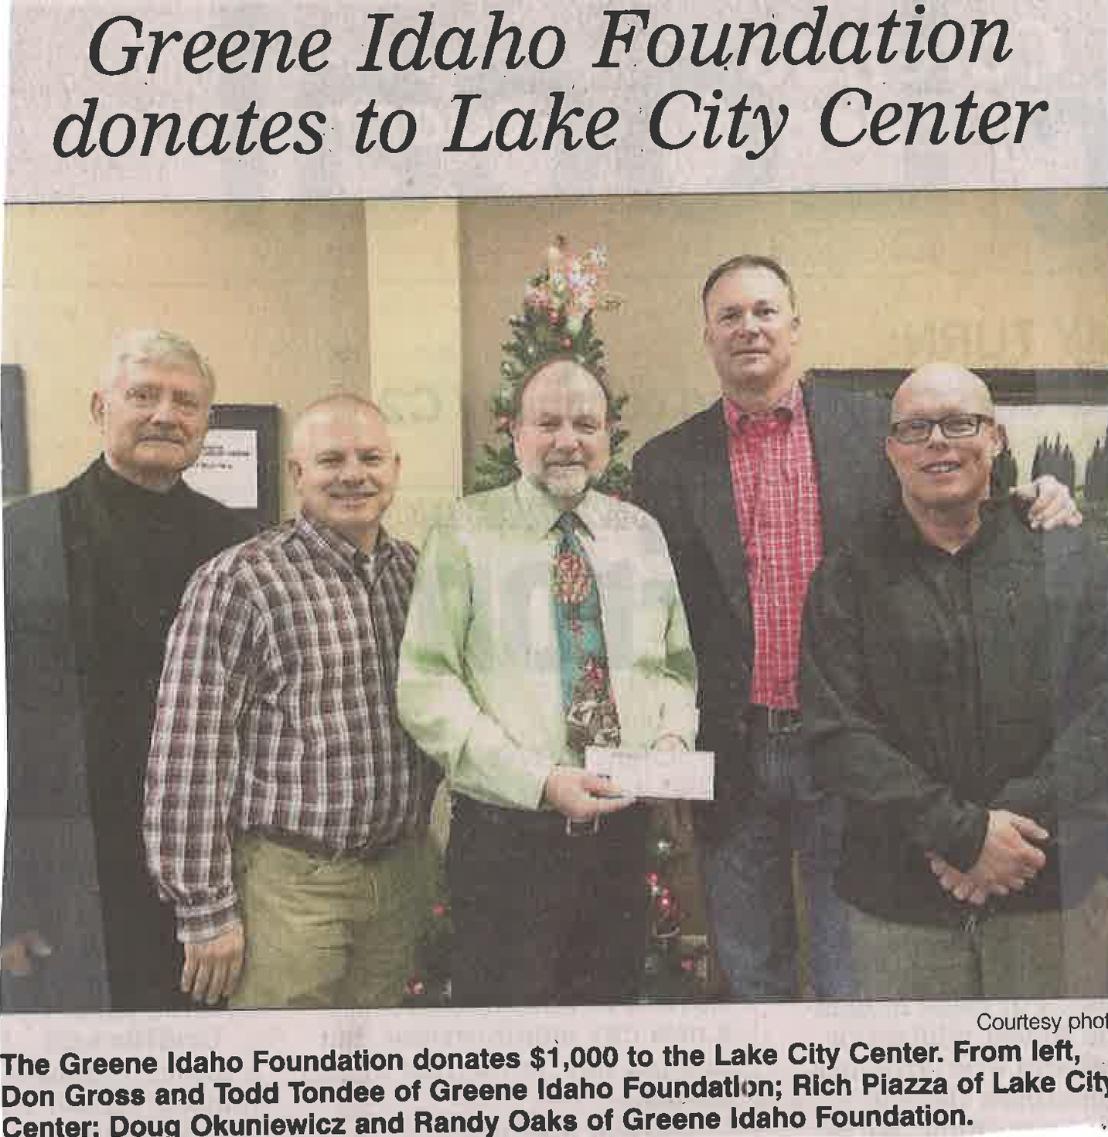 lake city donation photo 2015.png